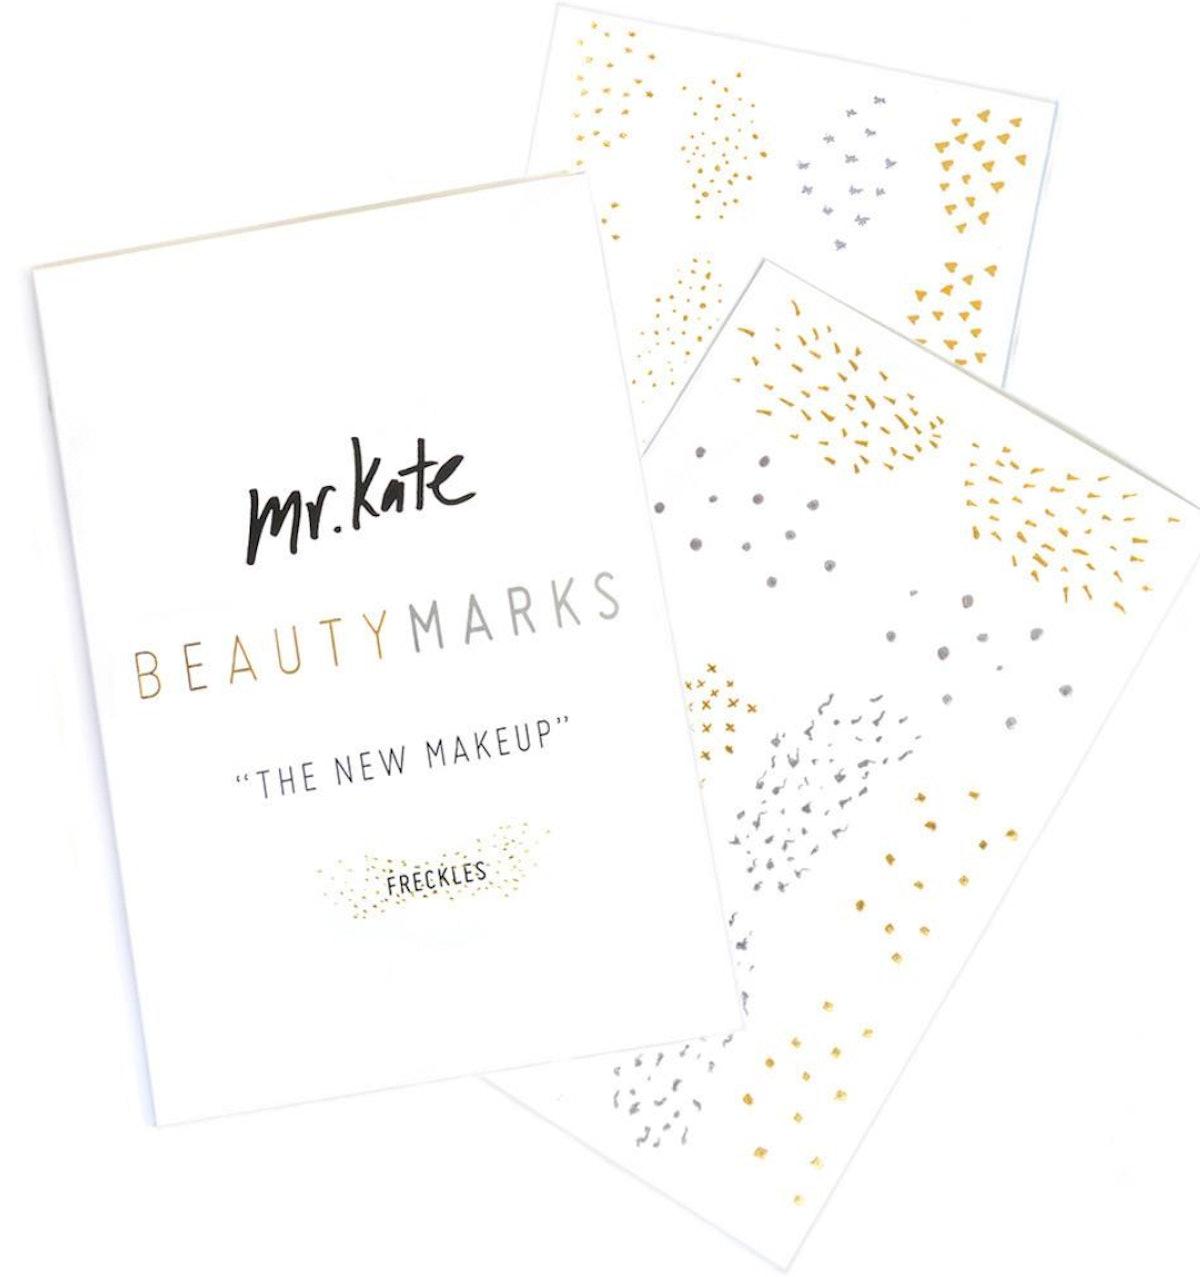 BeautyMarks Freckles